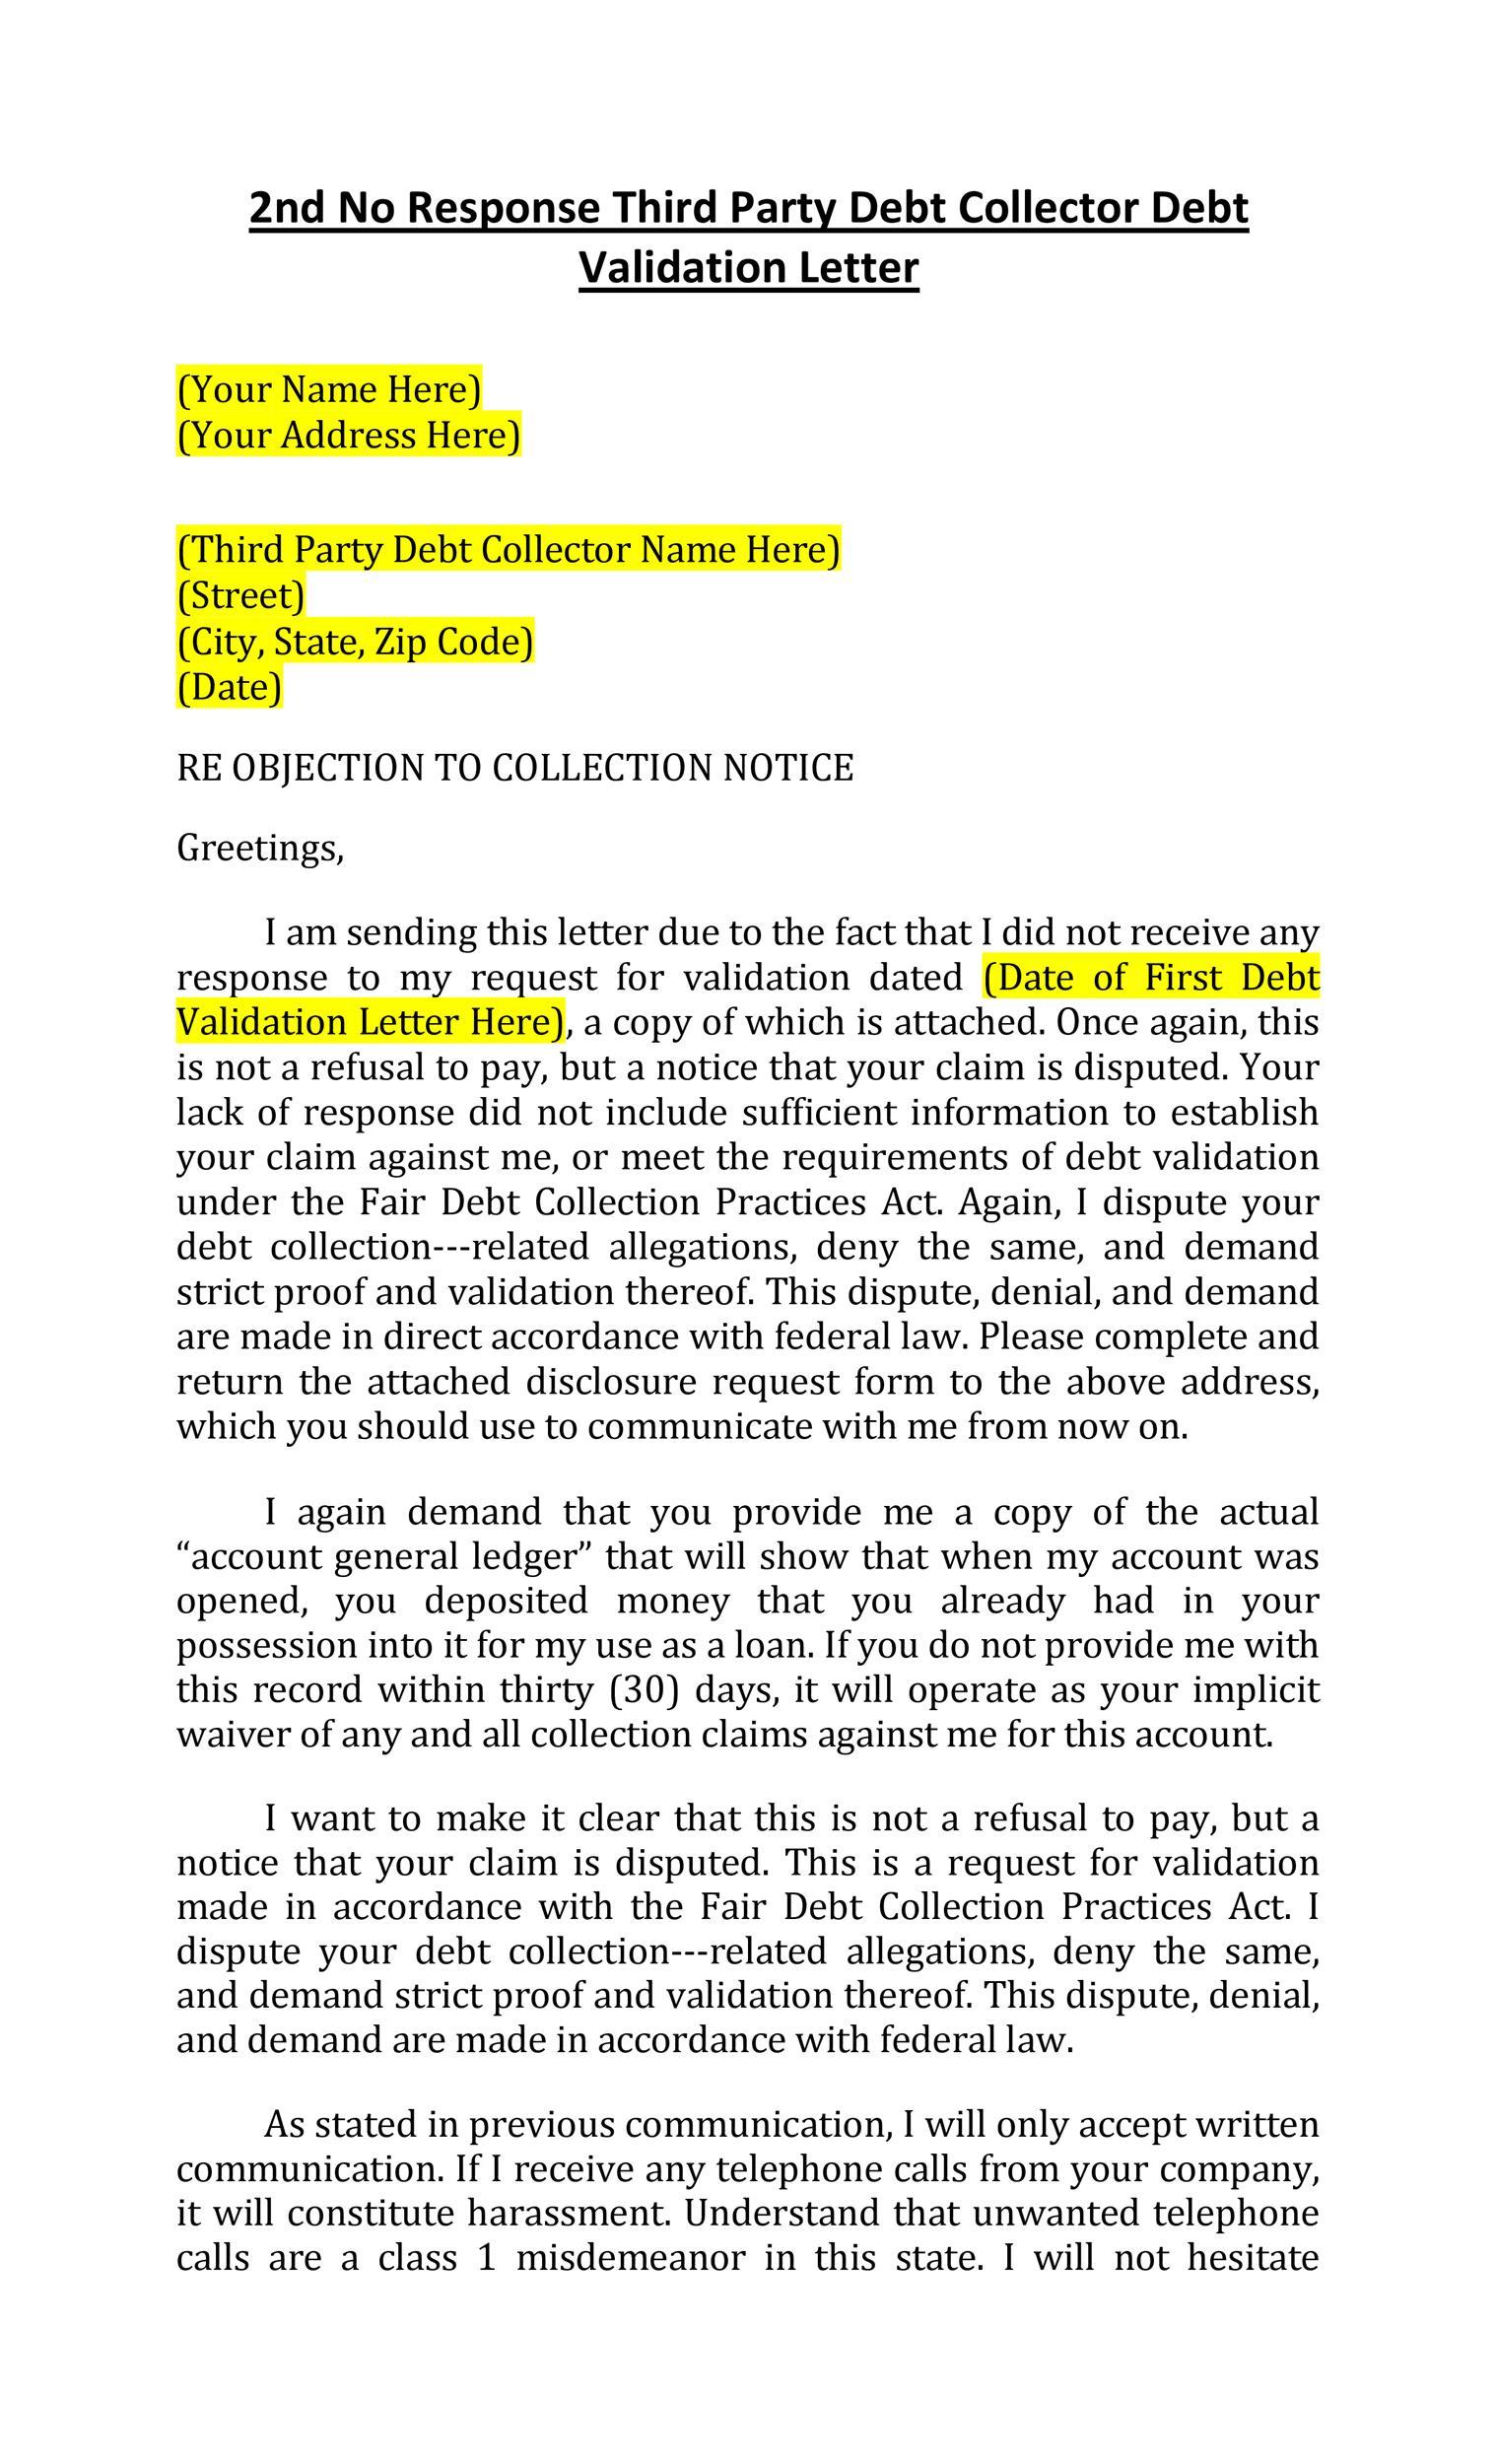 Free debt validation letter 13